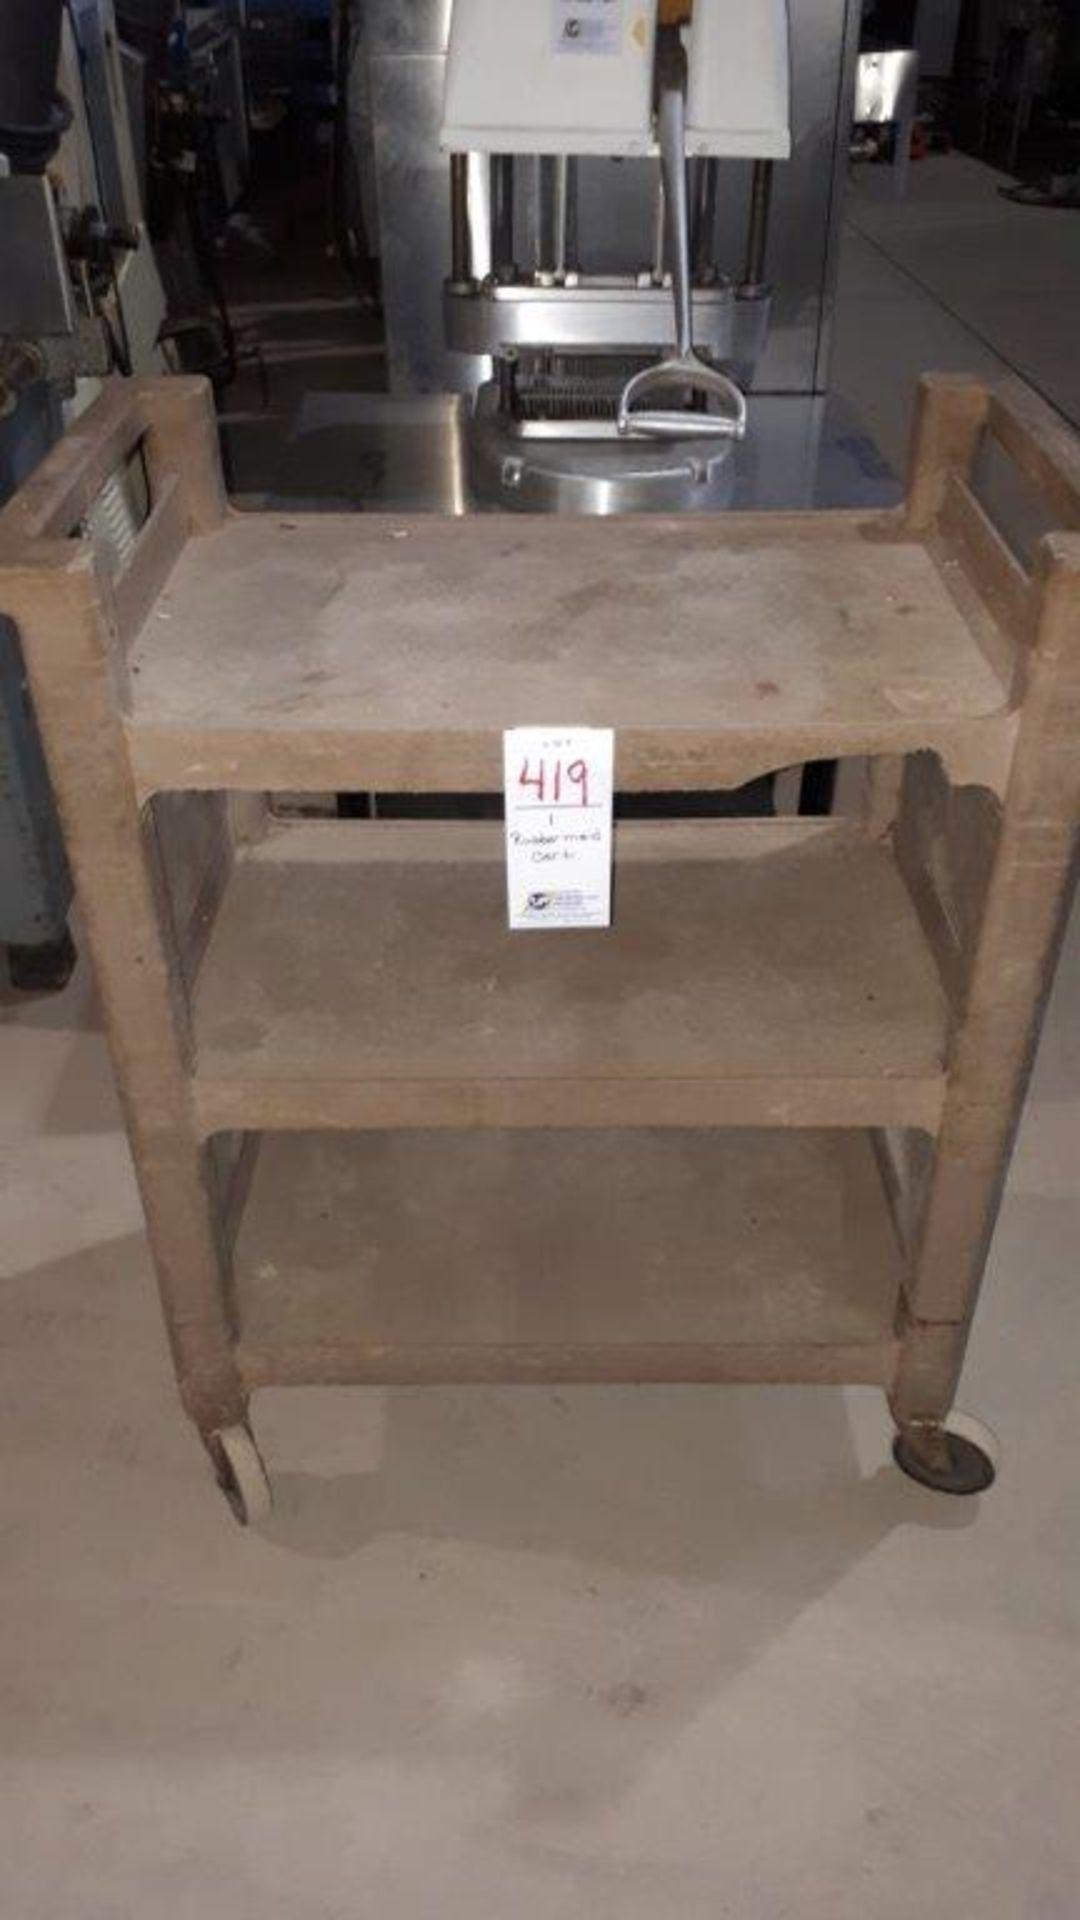 Rubbermaid cart